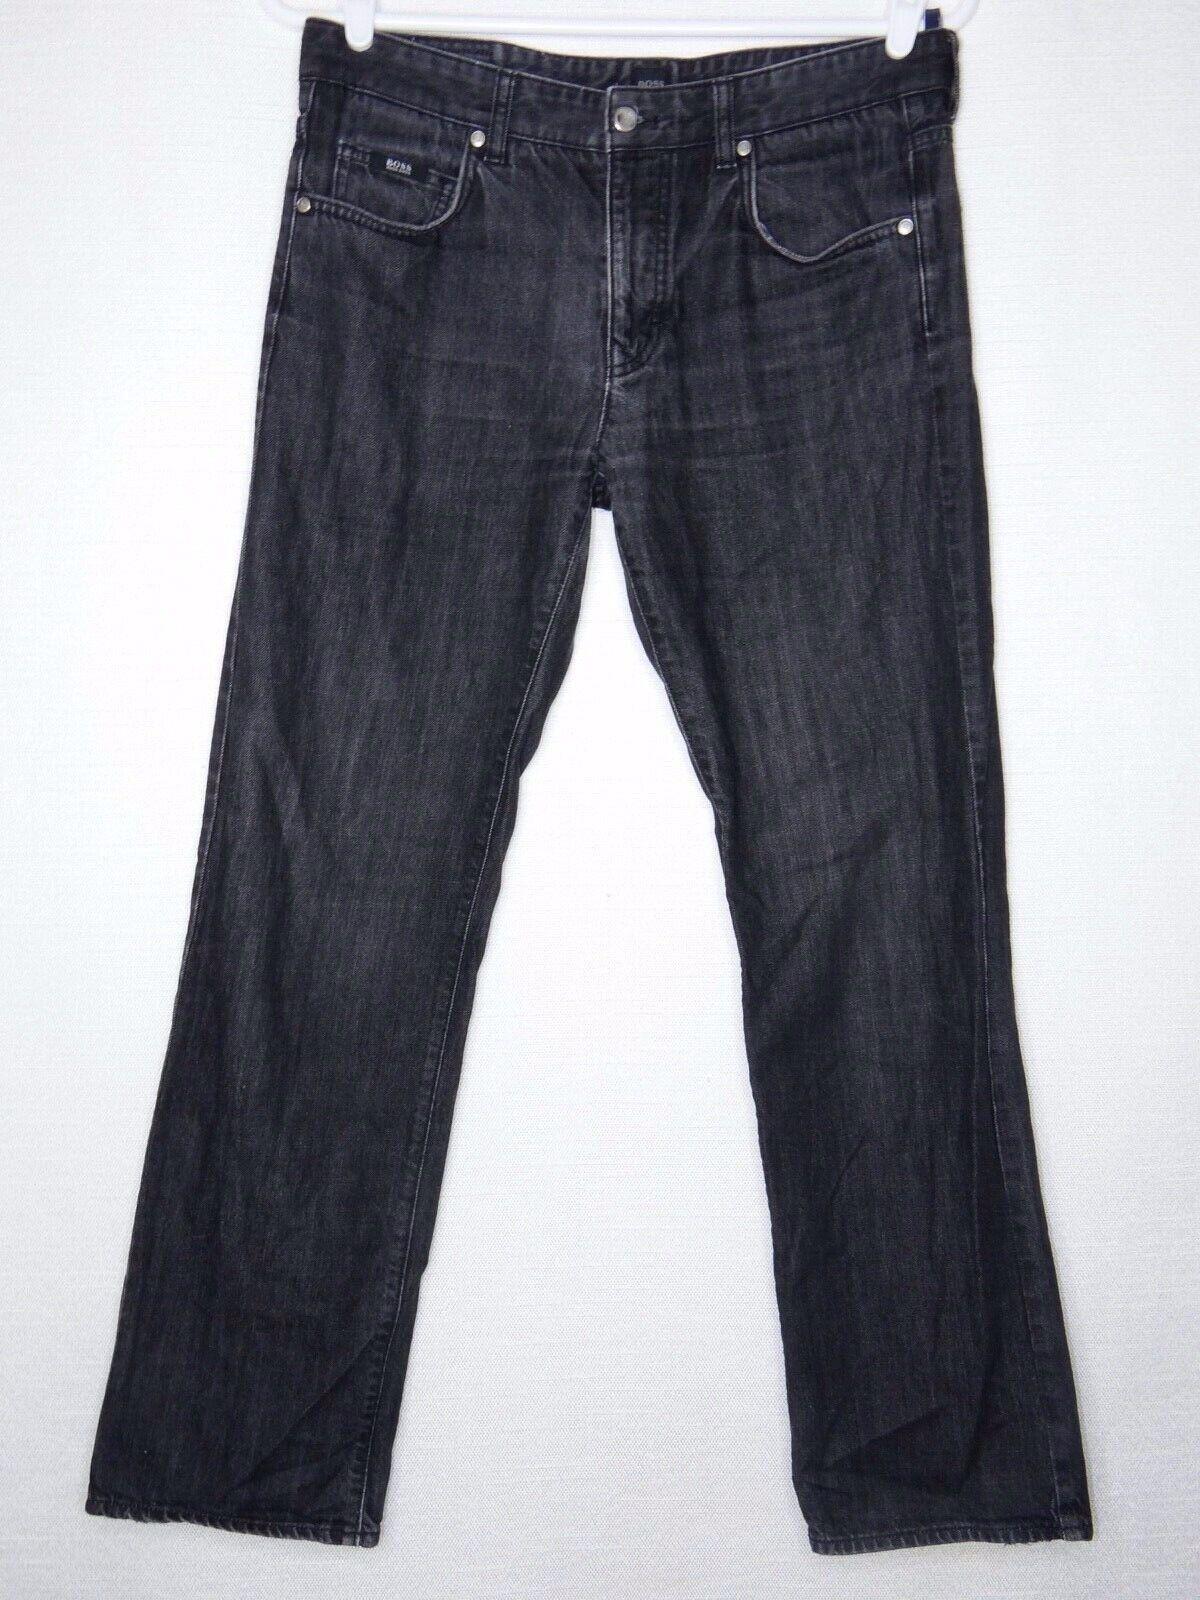 Hugo Boss Kansas 34 Acid Wash Regular Fit Jeans Inseam  31.5